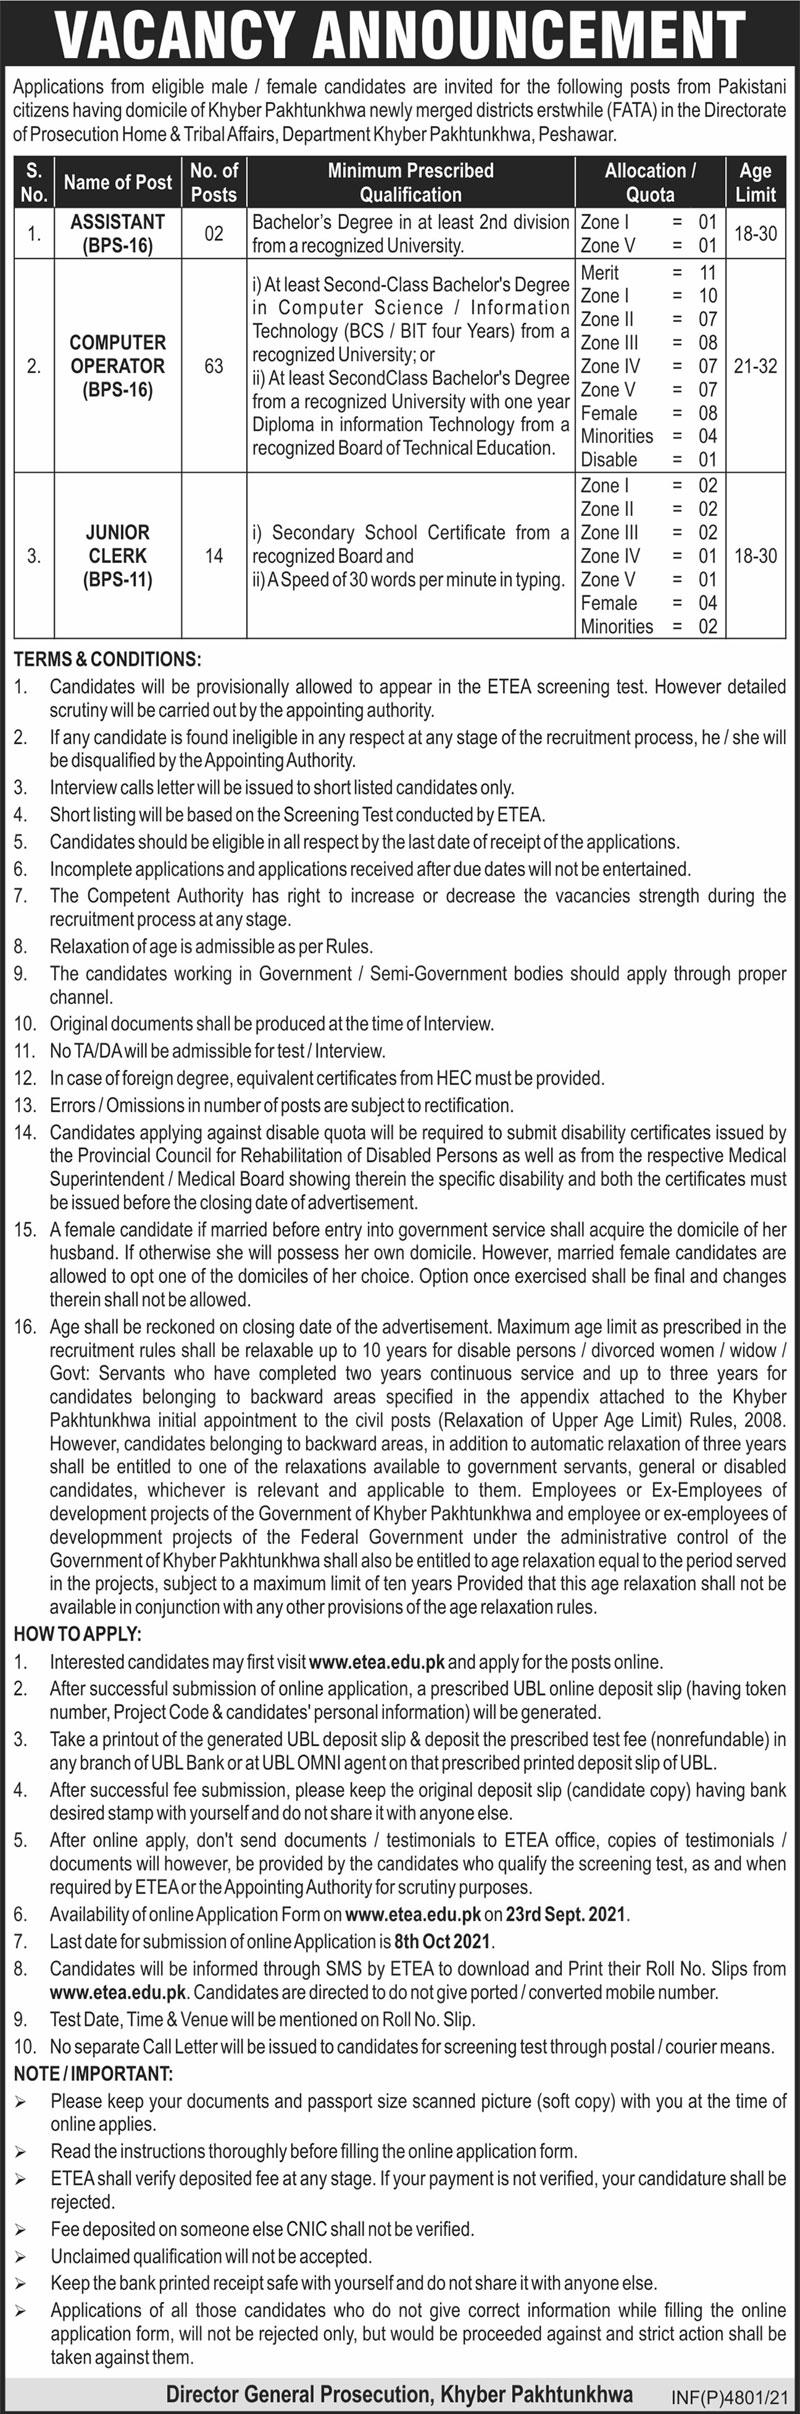 Home & Tribal Affairs Department Peshawar Jobs For Assistant, Computer Operator, Junior Clerk advertisemet in newspaper on September 21,2021